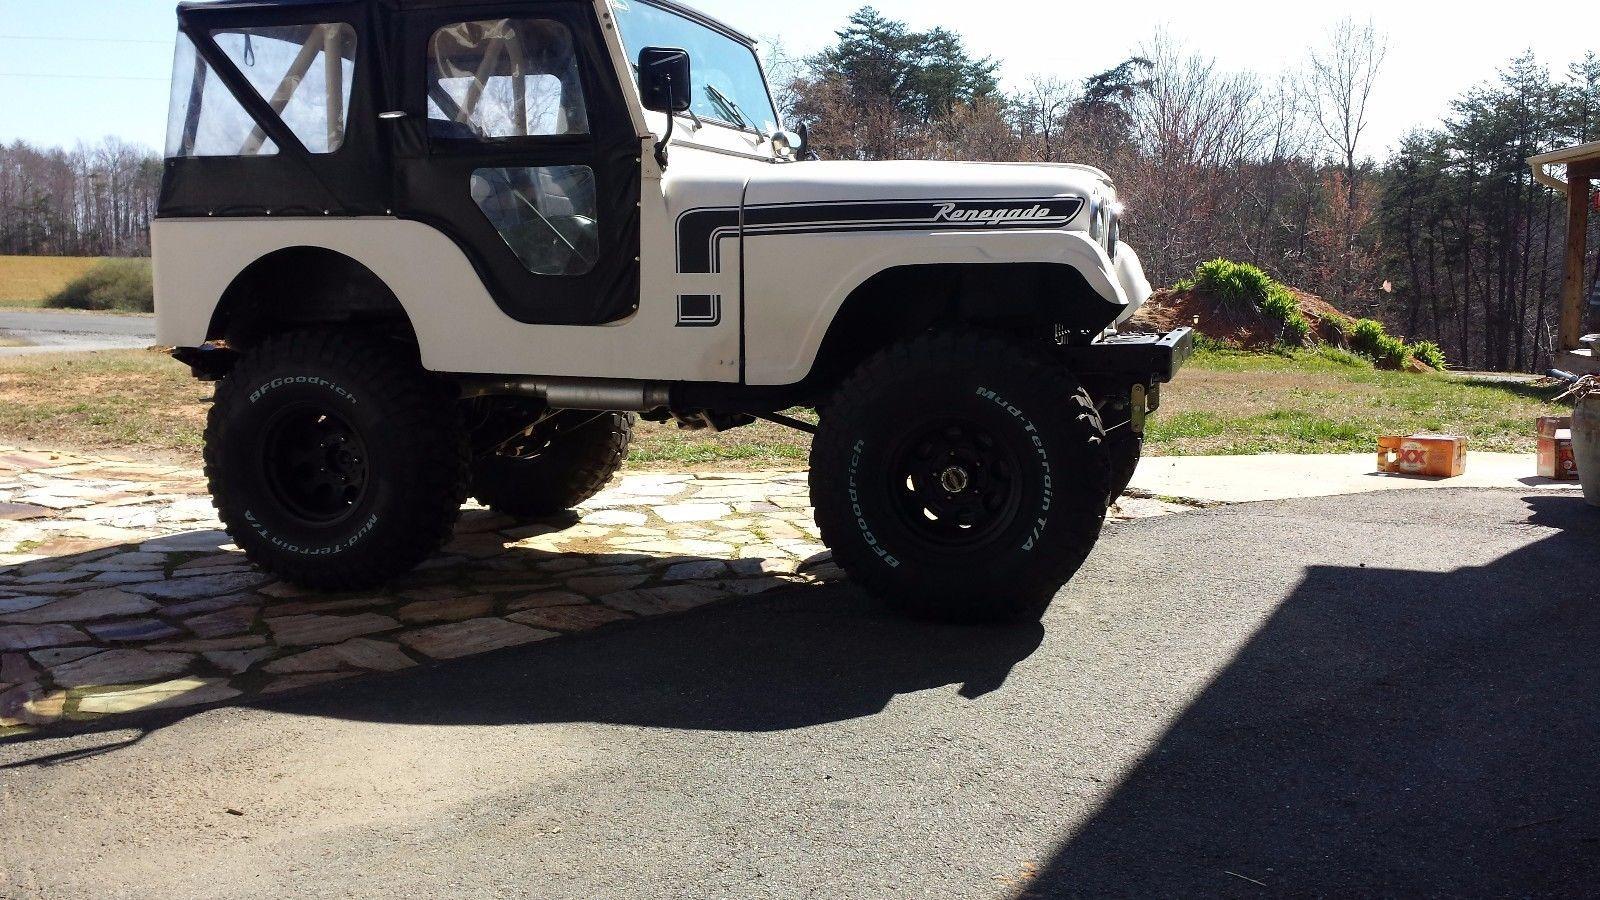 hight resolution of ebay 1974 jeep cj renegade 1974 cj5 renegade 304 v8 jeep jeeplife usdeals rssdata net